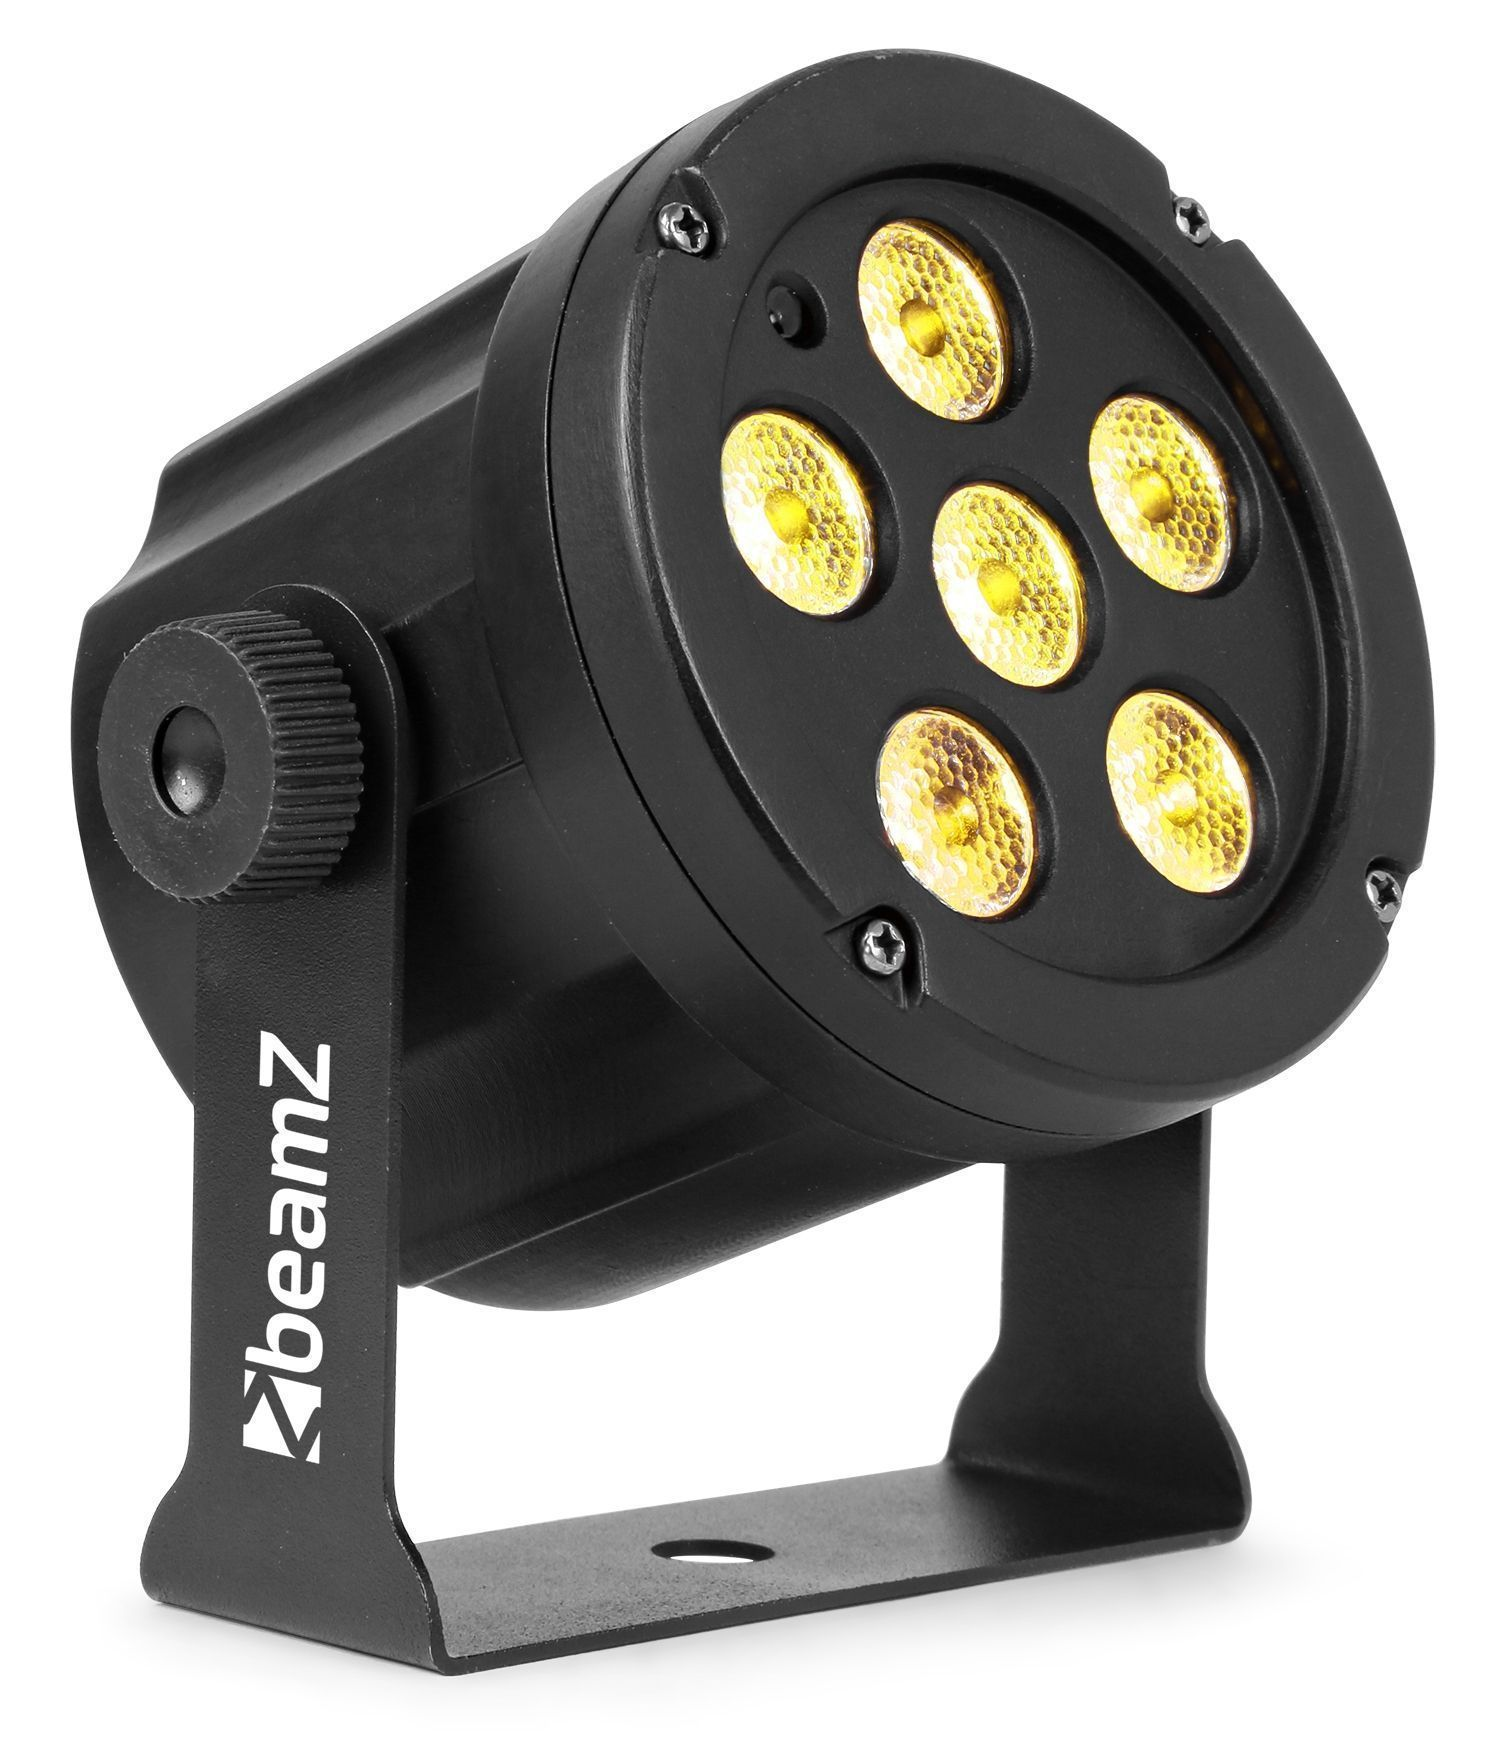 BeamZ SlimPar30 - Warm en cool white + blacklight - 6 LED's van 6W per LED